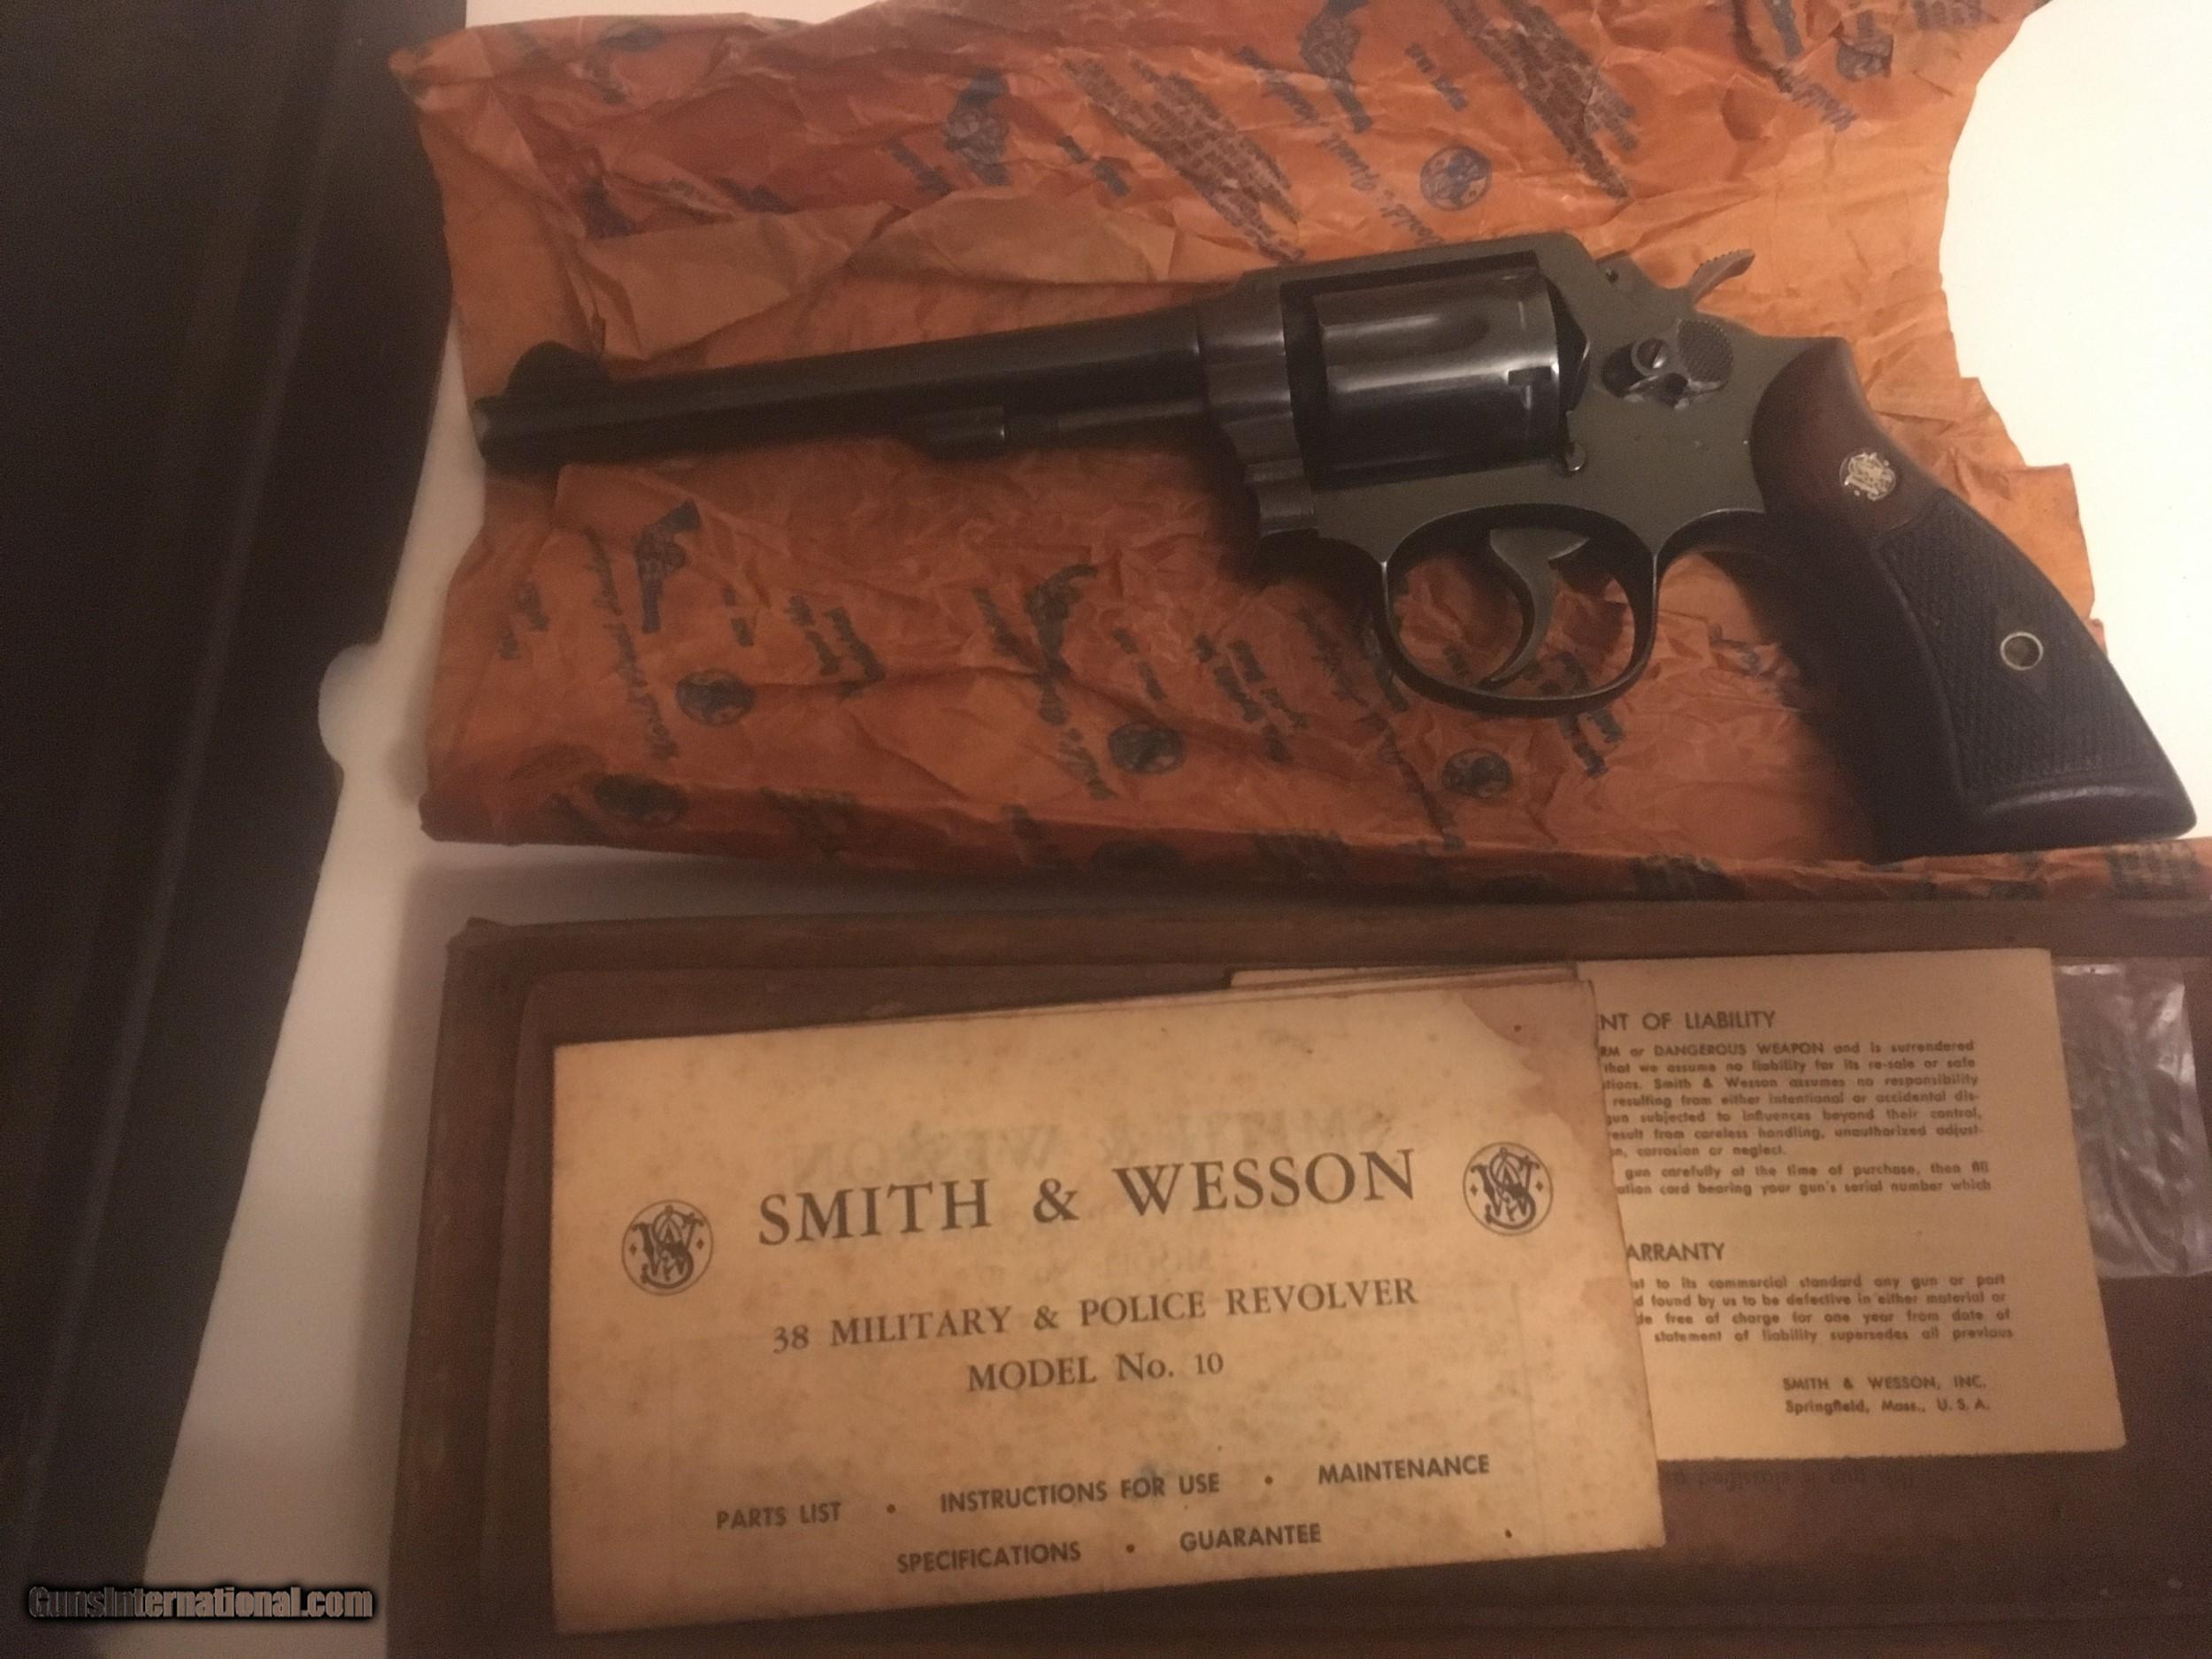 Dating Smith ja Wesson malli 10